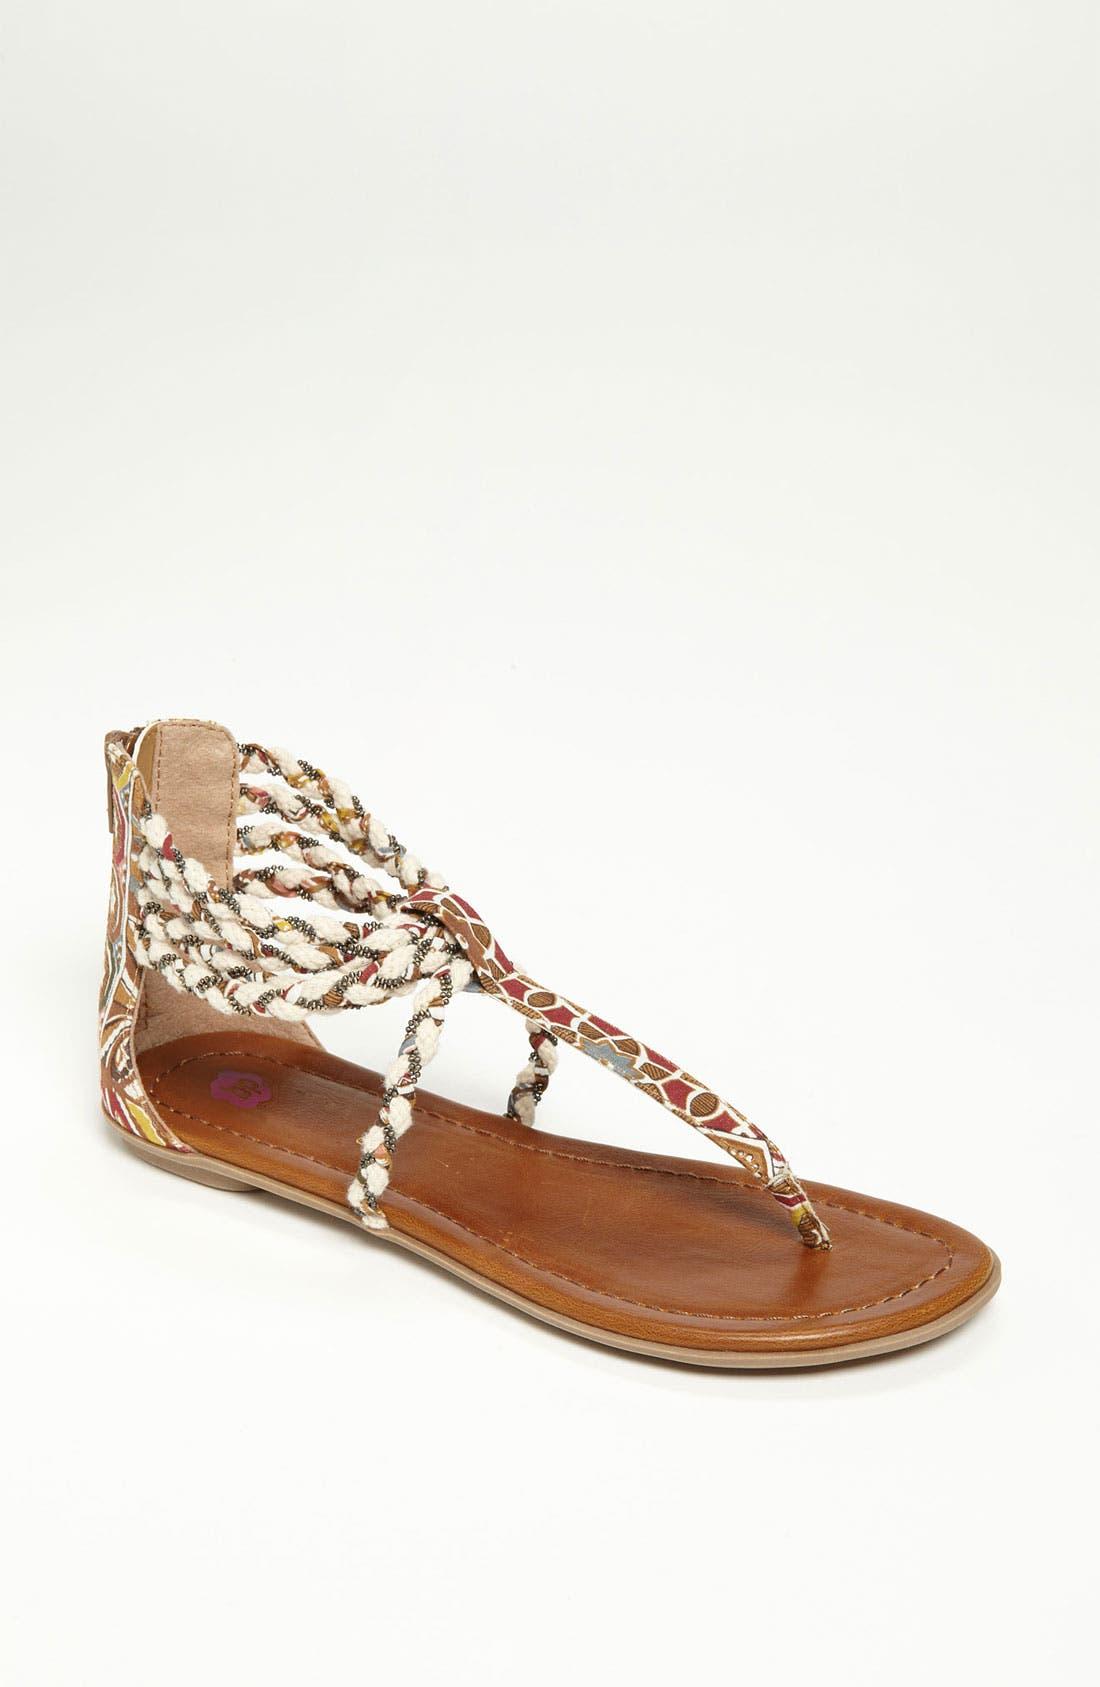 Alternate Image 1 Selected - BP. 'Marta' Sandal